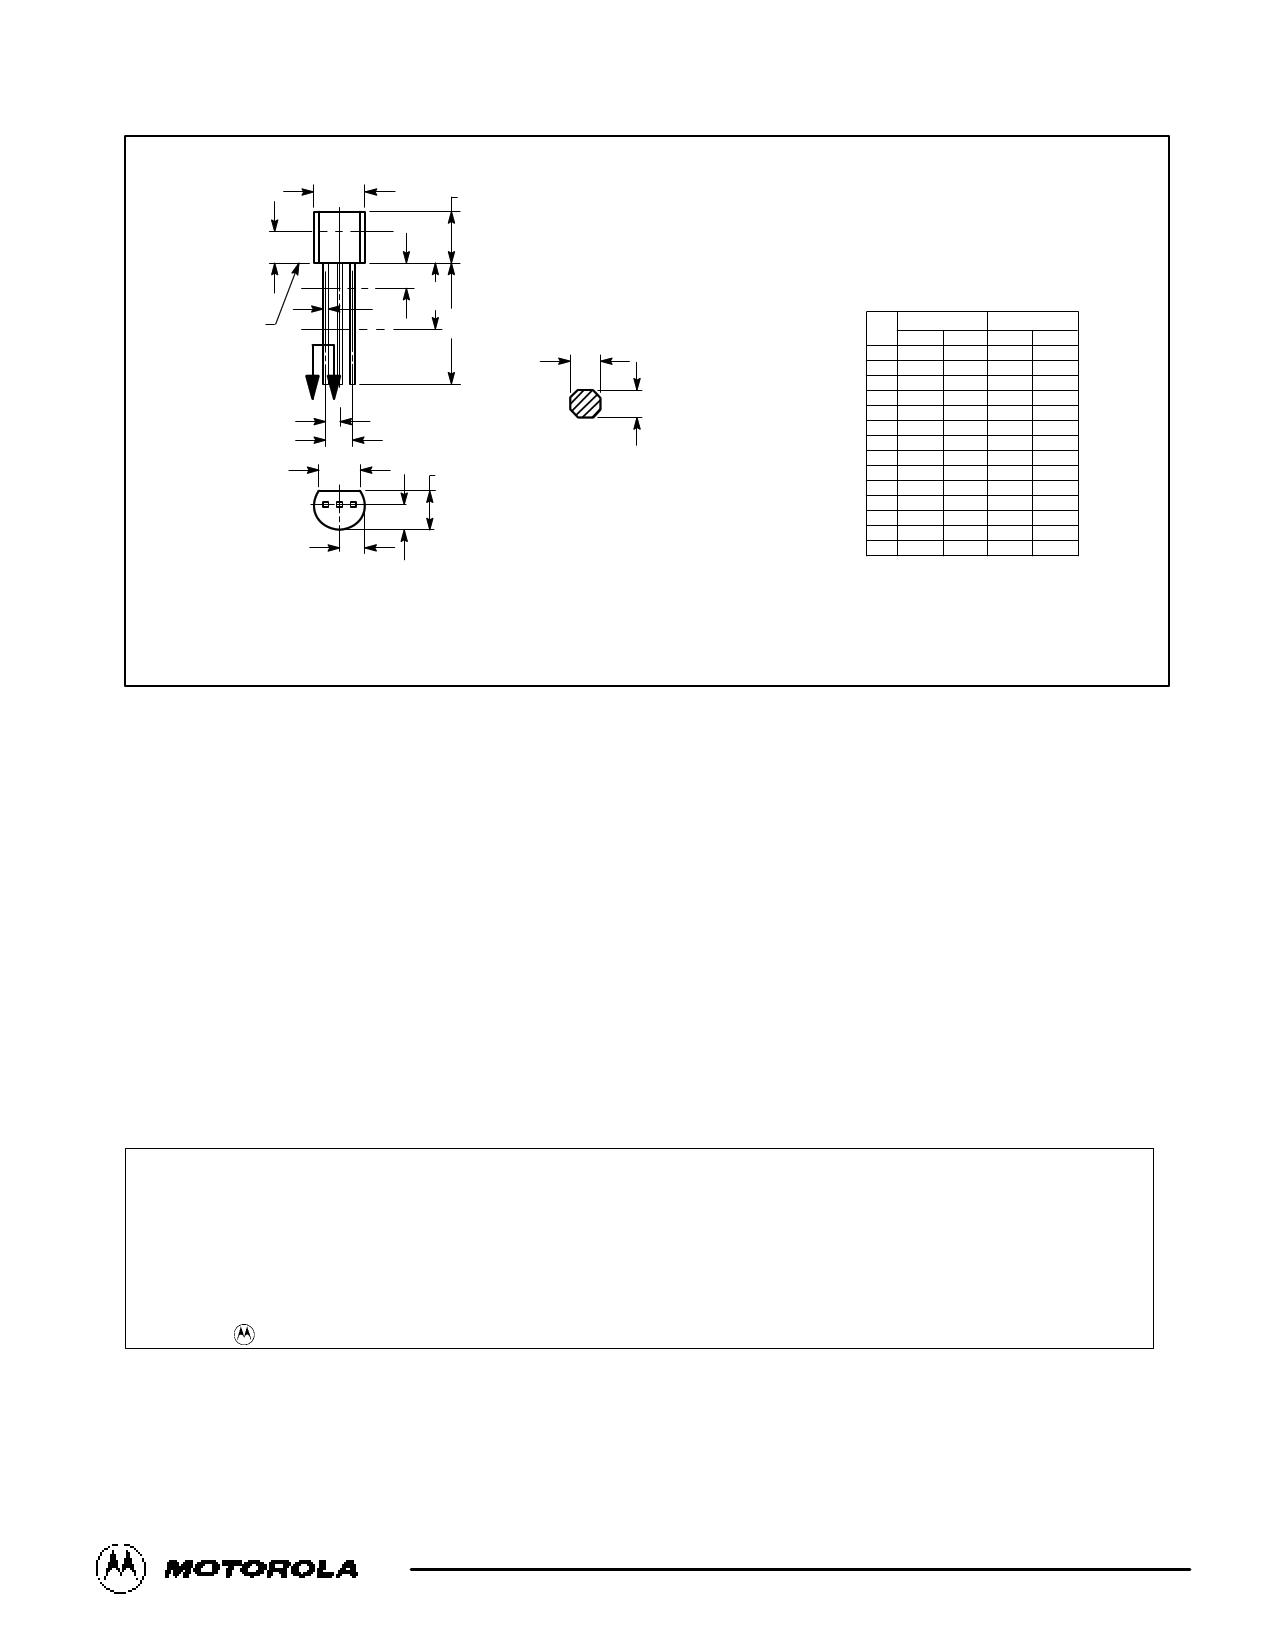 BC550C pdf, 반도체, 판매, 대치품